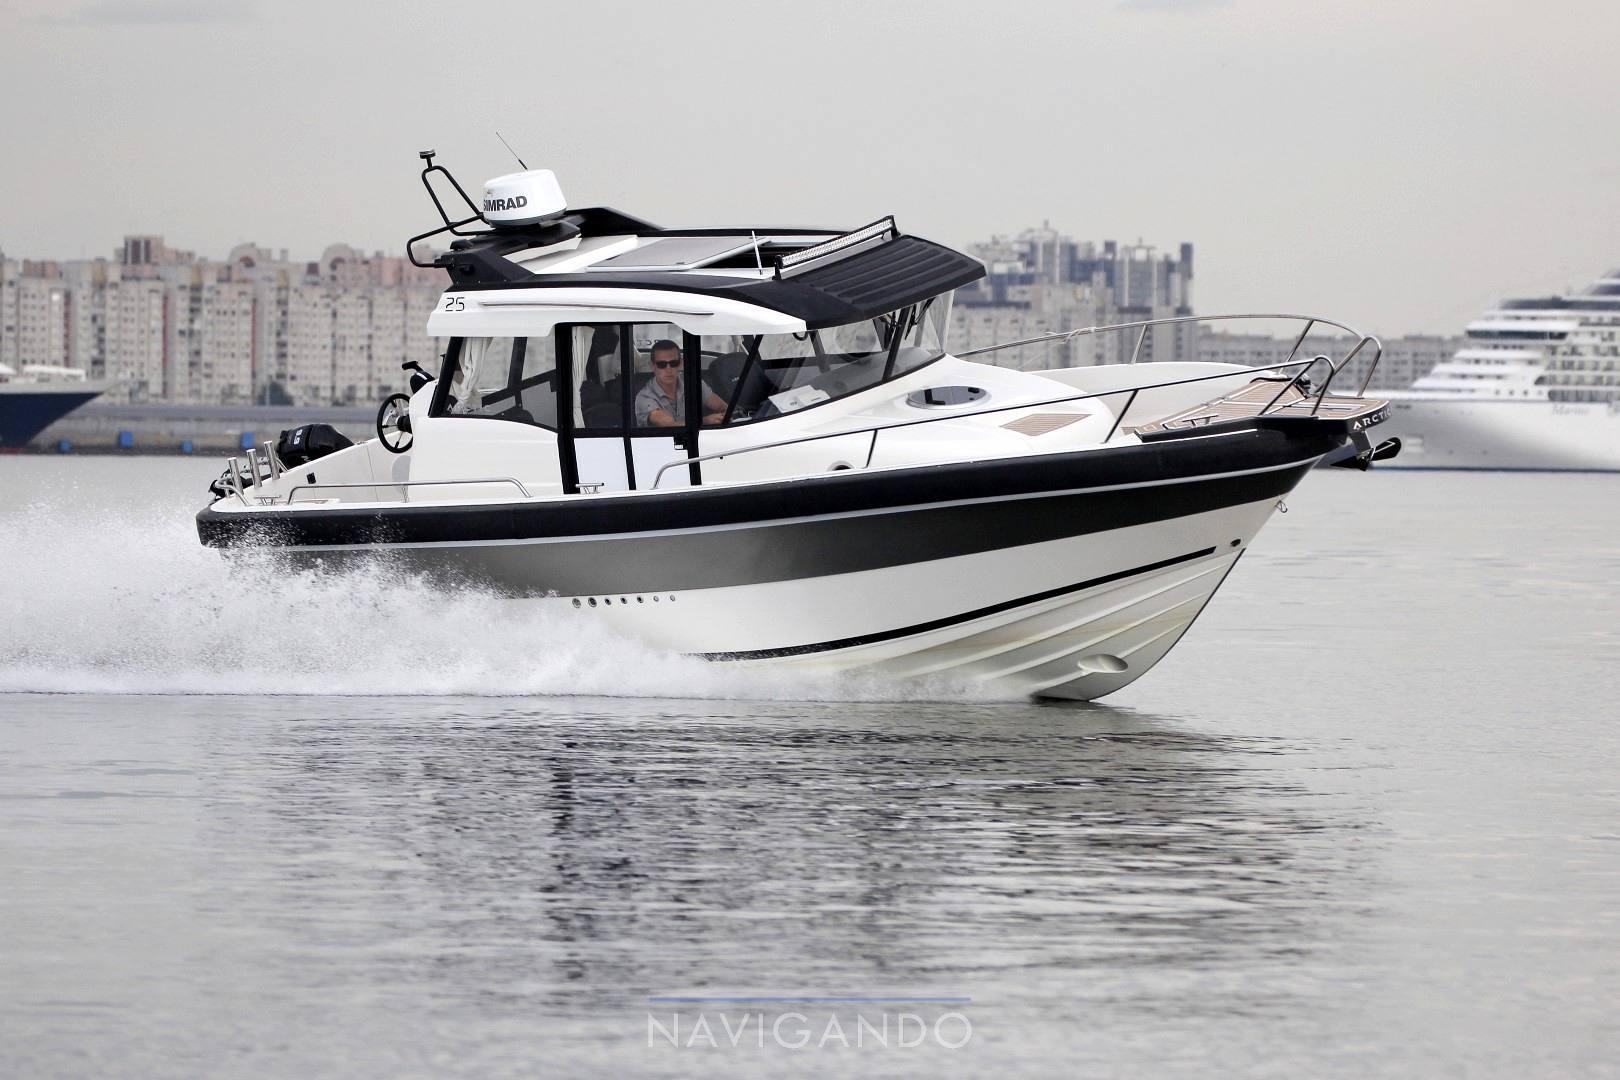 Artic Commuter 25 motor boat